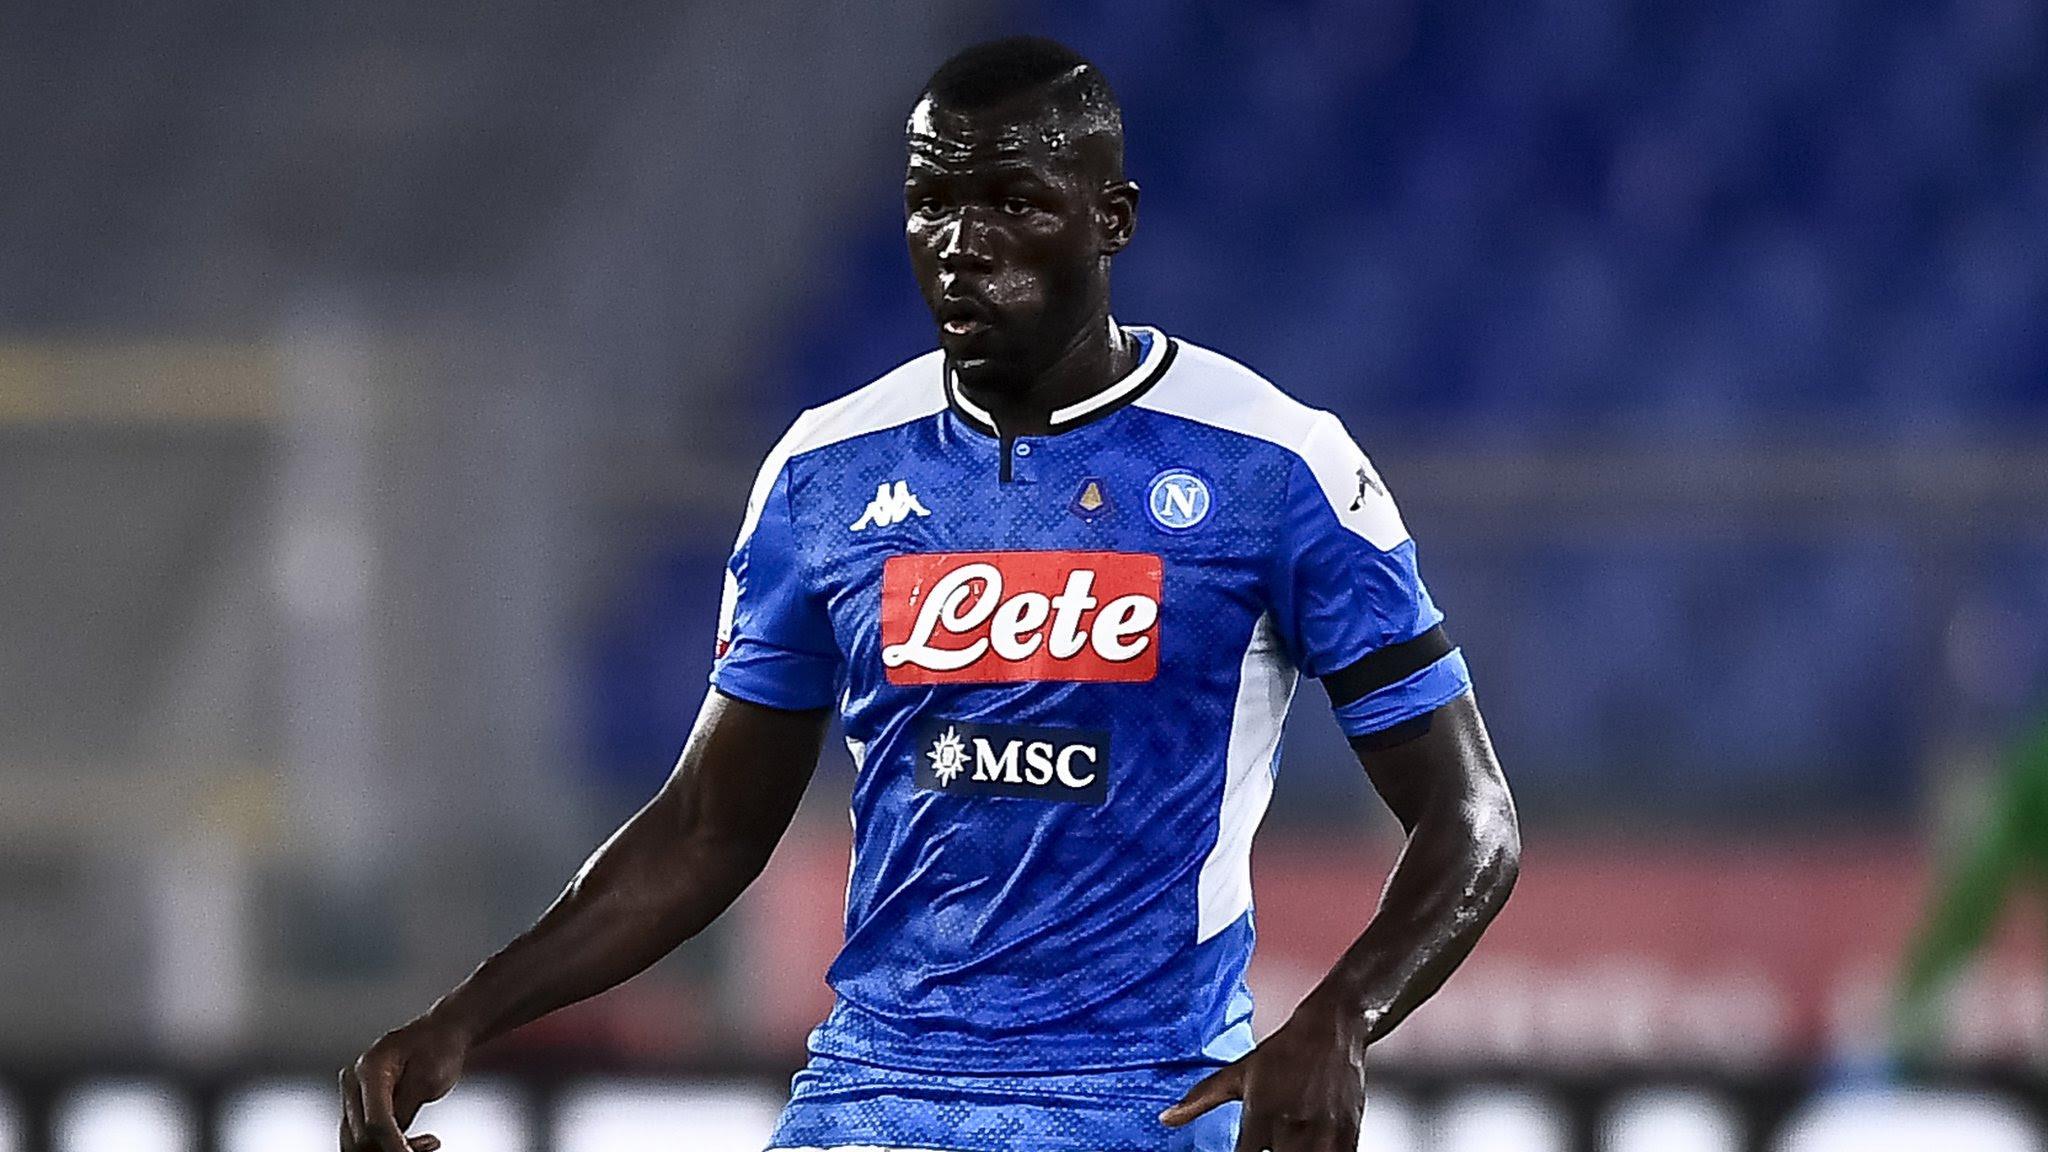 Transfer rumours: Koulibaly, Pochettino, Skriniar, Hakimi, Moreno, Tagliafico